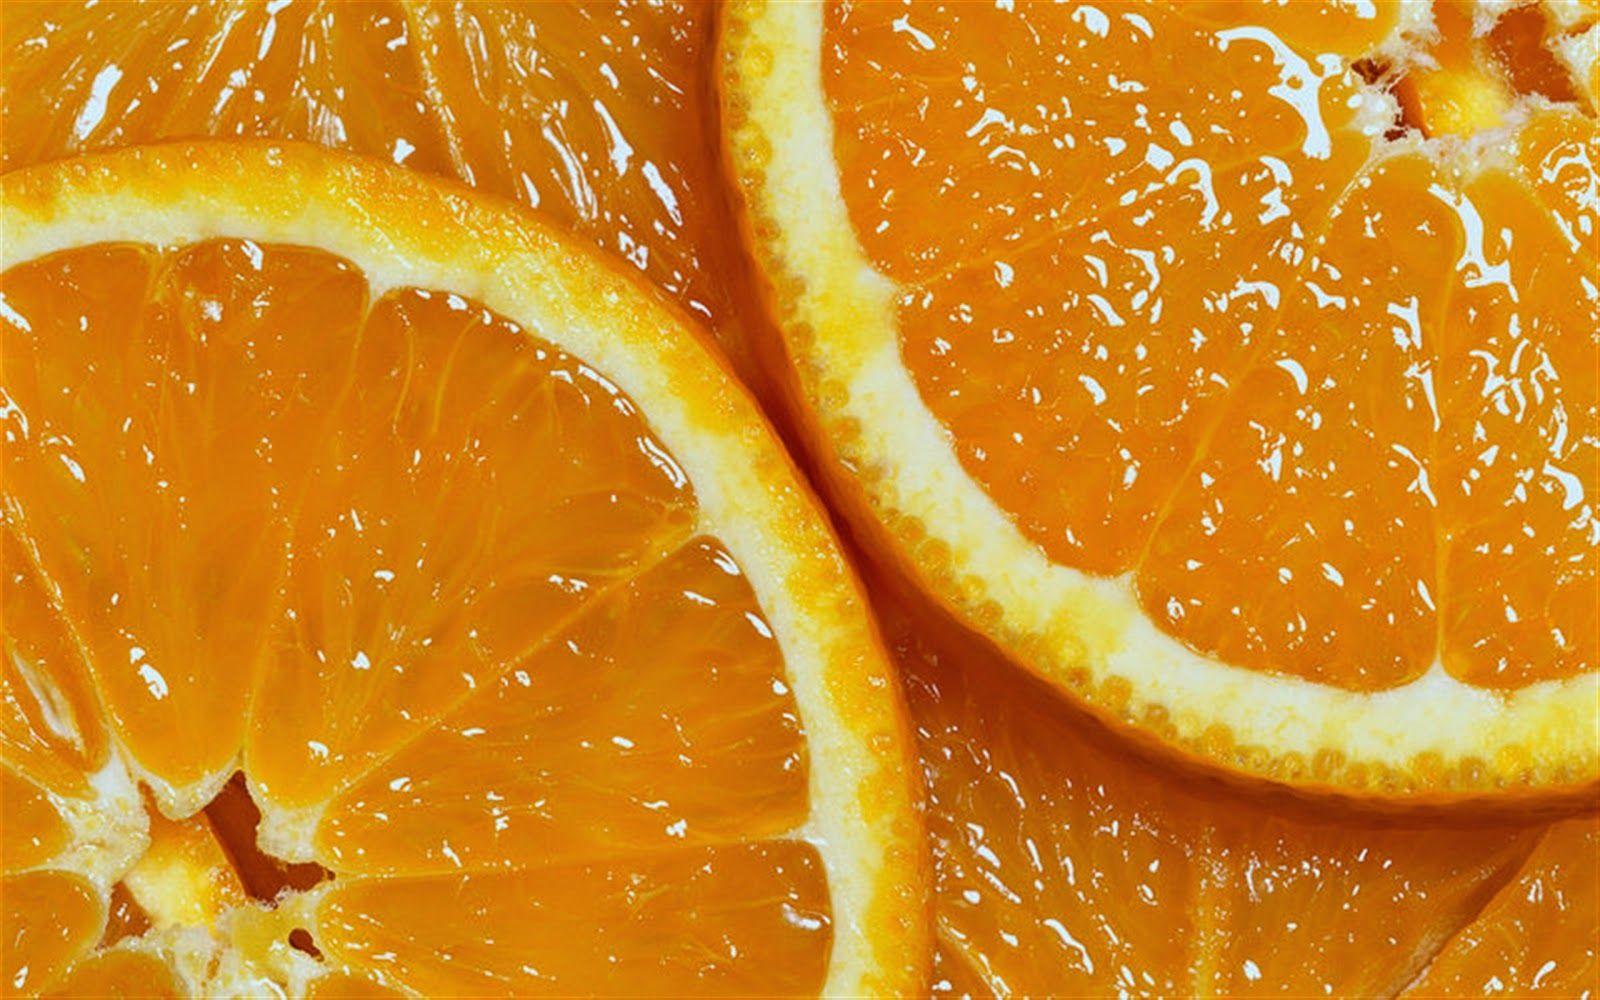 50 Simple But Impressive Macro Photography Ideas In 2021 Orange Aesthetic Orange Aesthetic Hd wallpaper orange slice bubbles macro